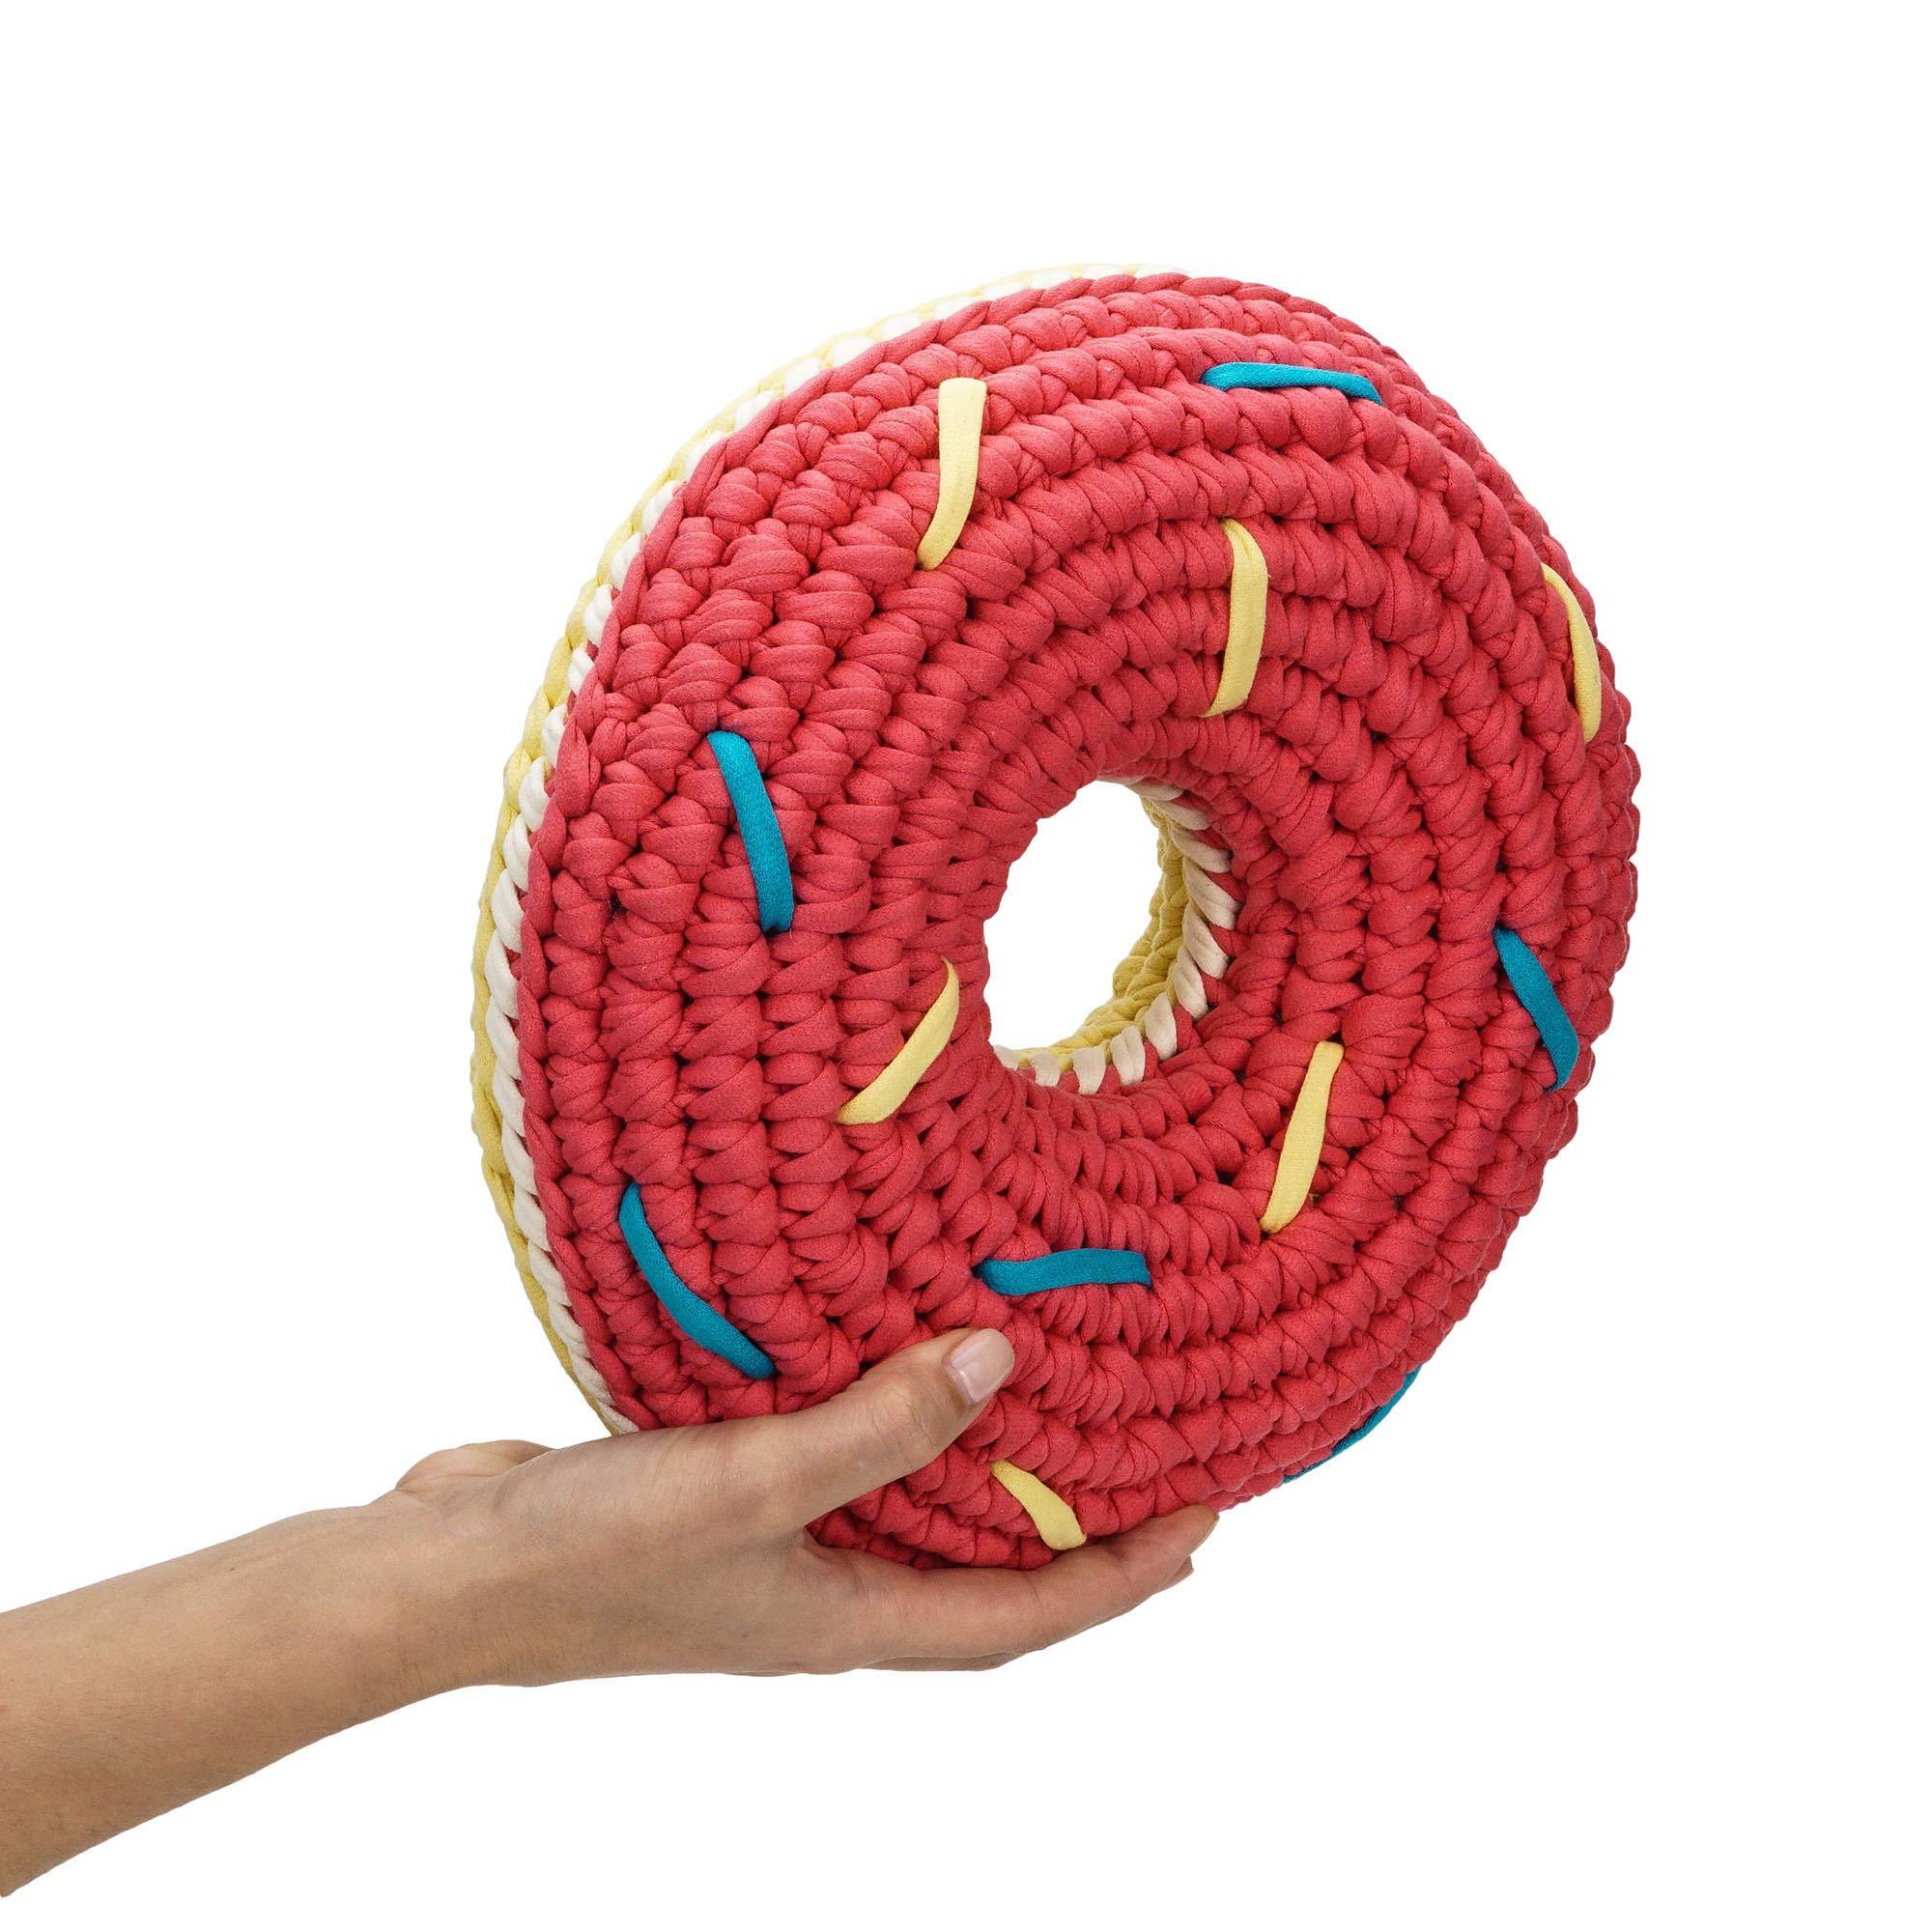 Crochet Patterns Amigurumi Dinosaur Softie [CROCHET FREE PATTERNS ... | 2000x2000